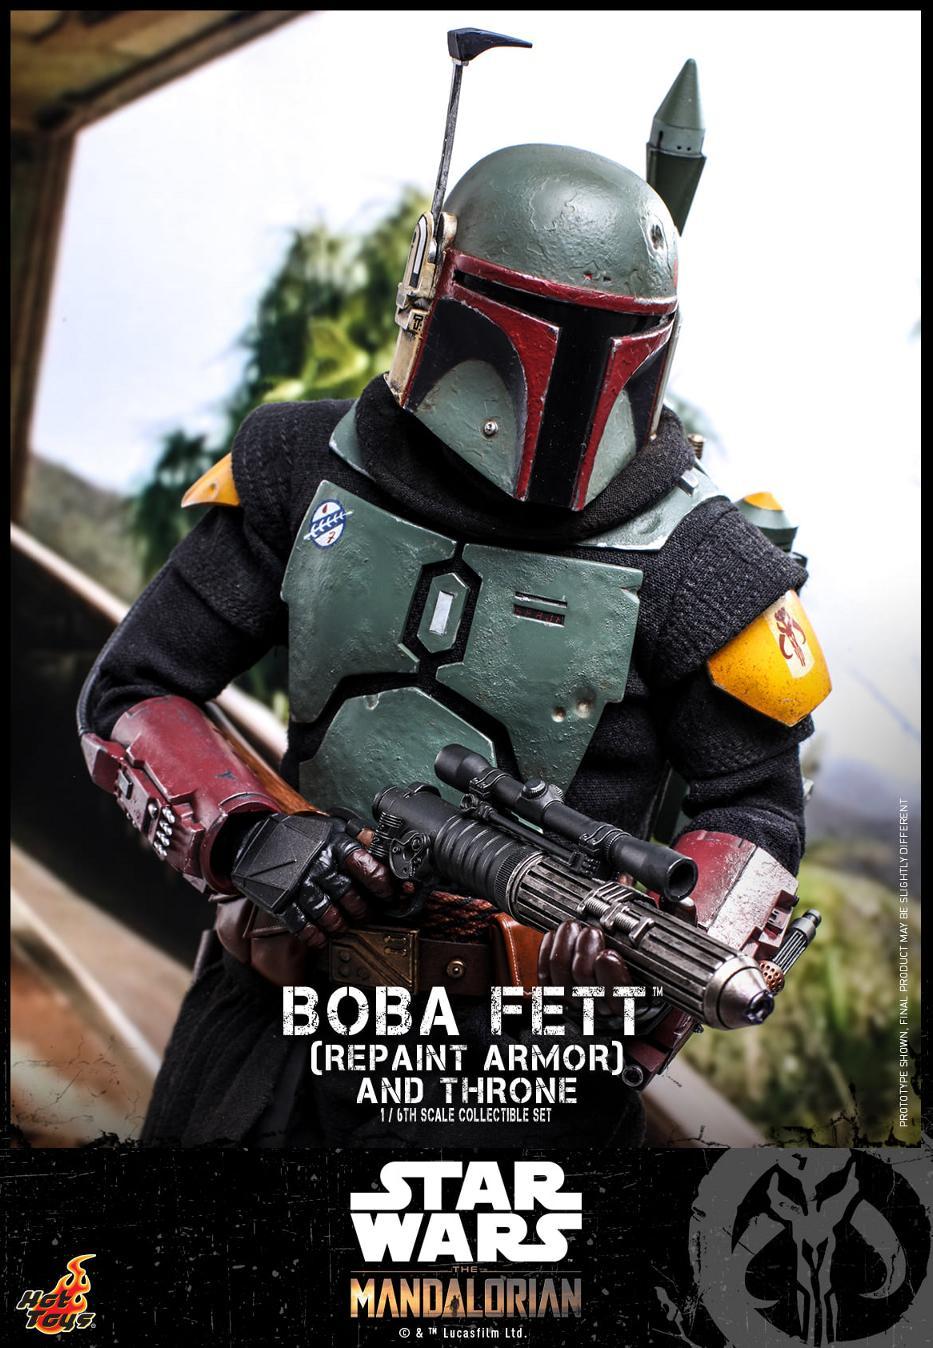 Boba Fett (Repaint Armor) & Throne Collectible Set Hot Toys Boba_f50